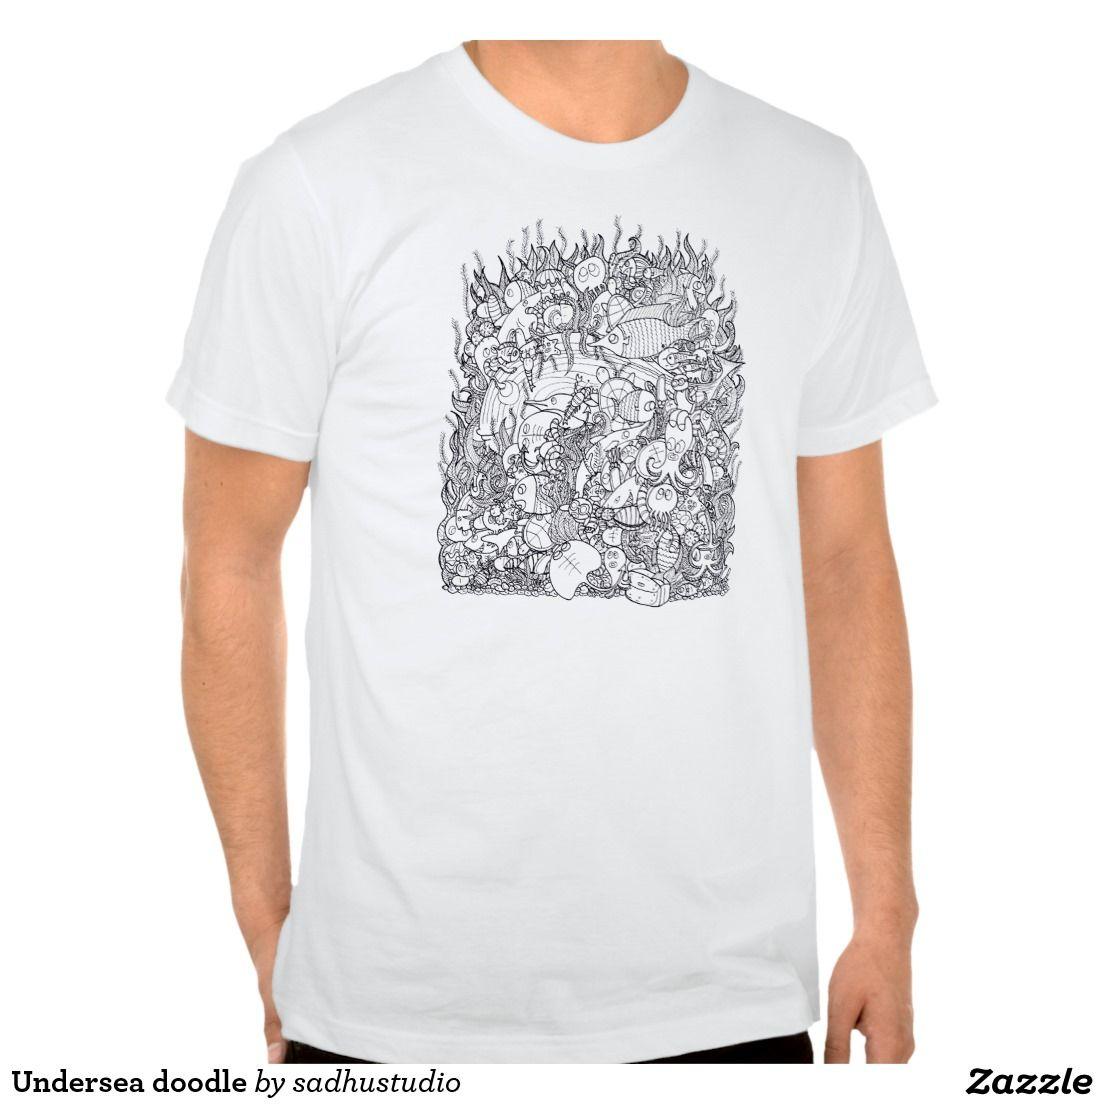 Undersea doodle t-shirts